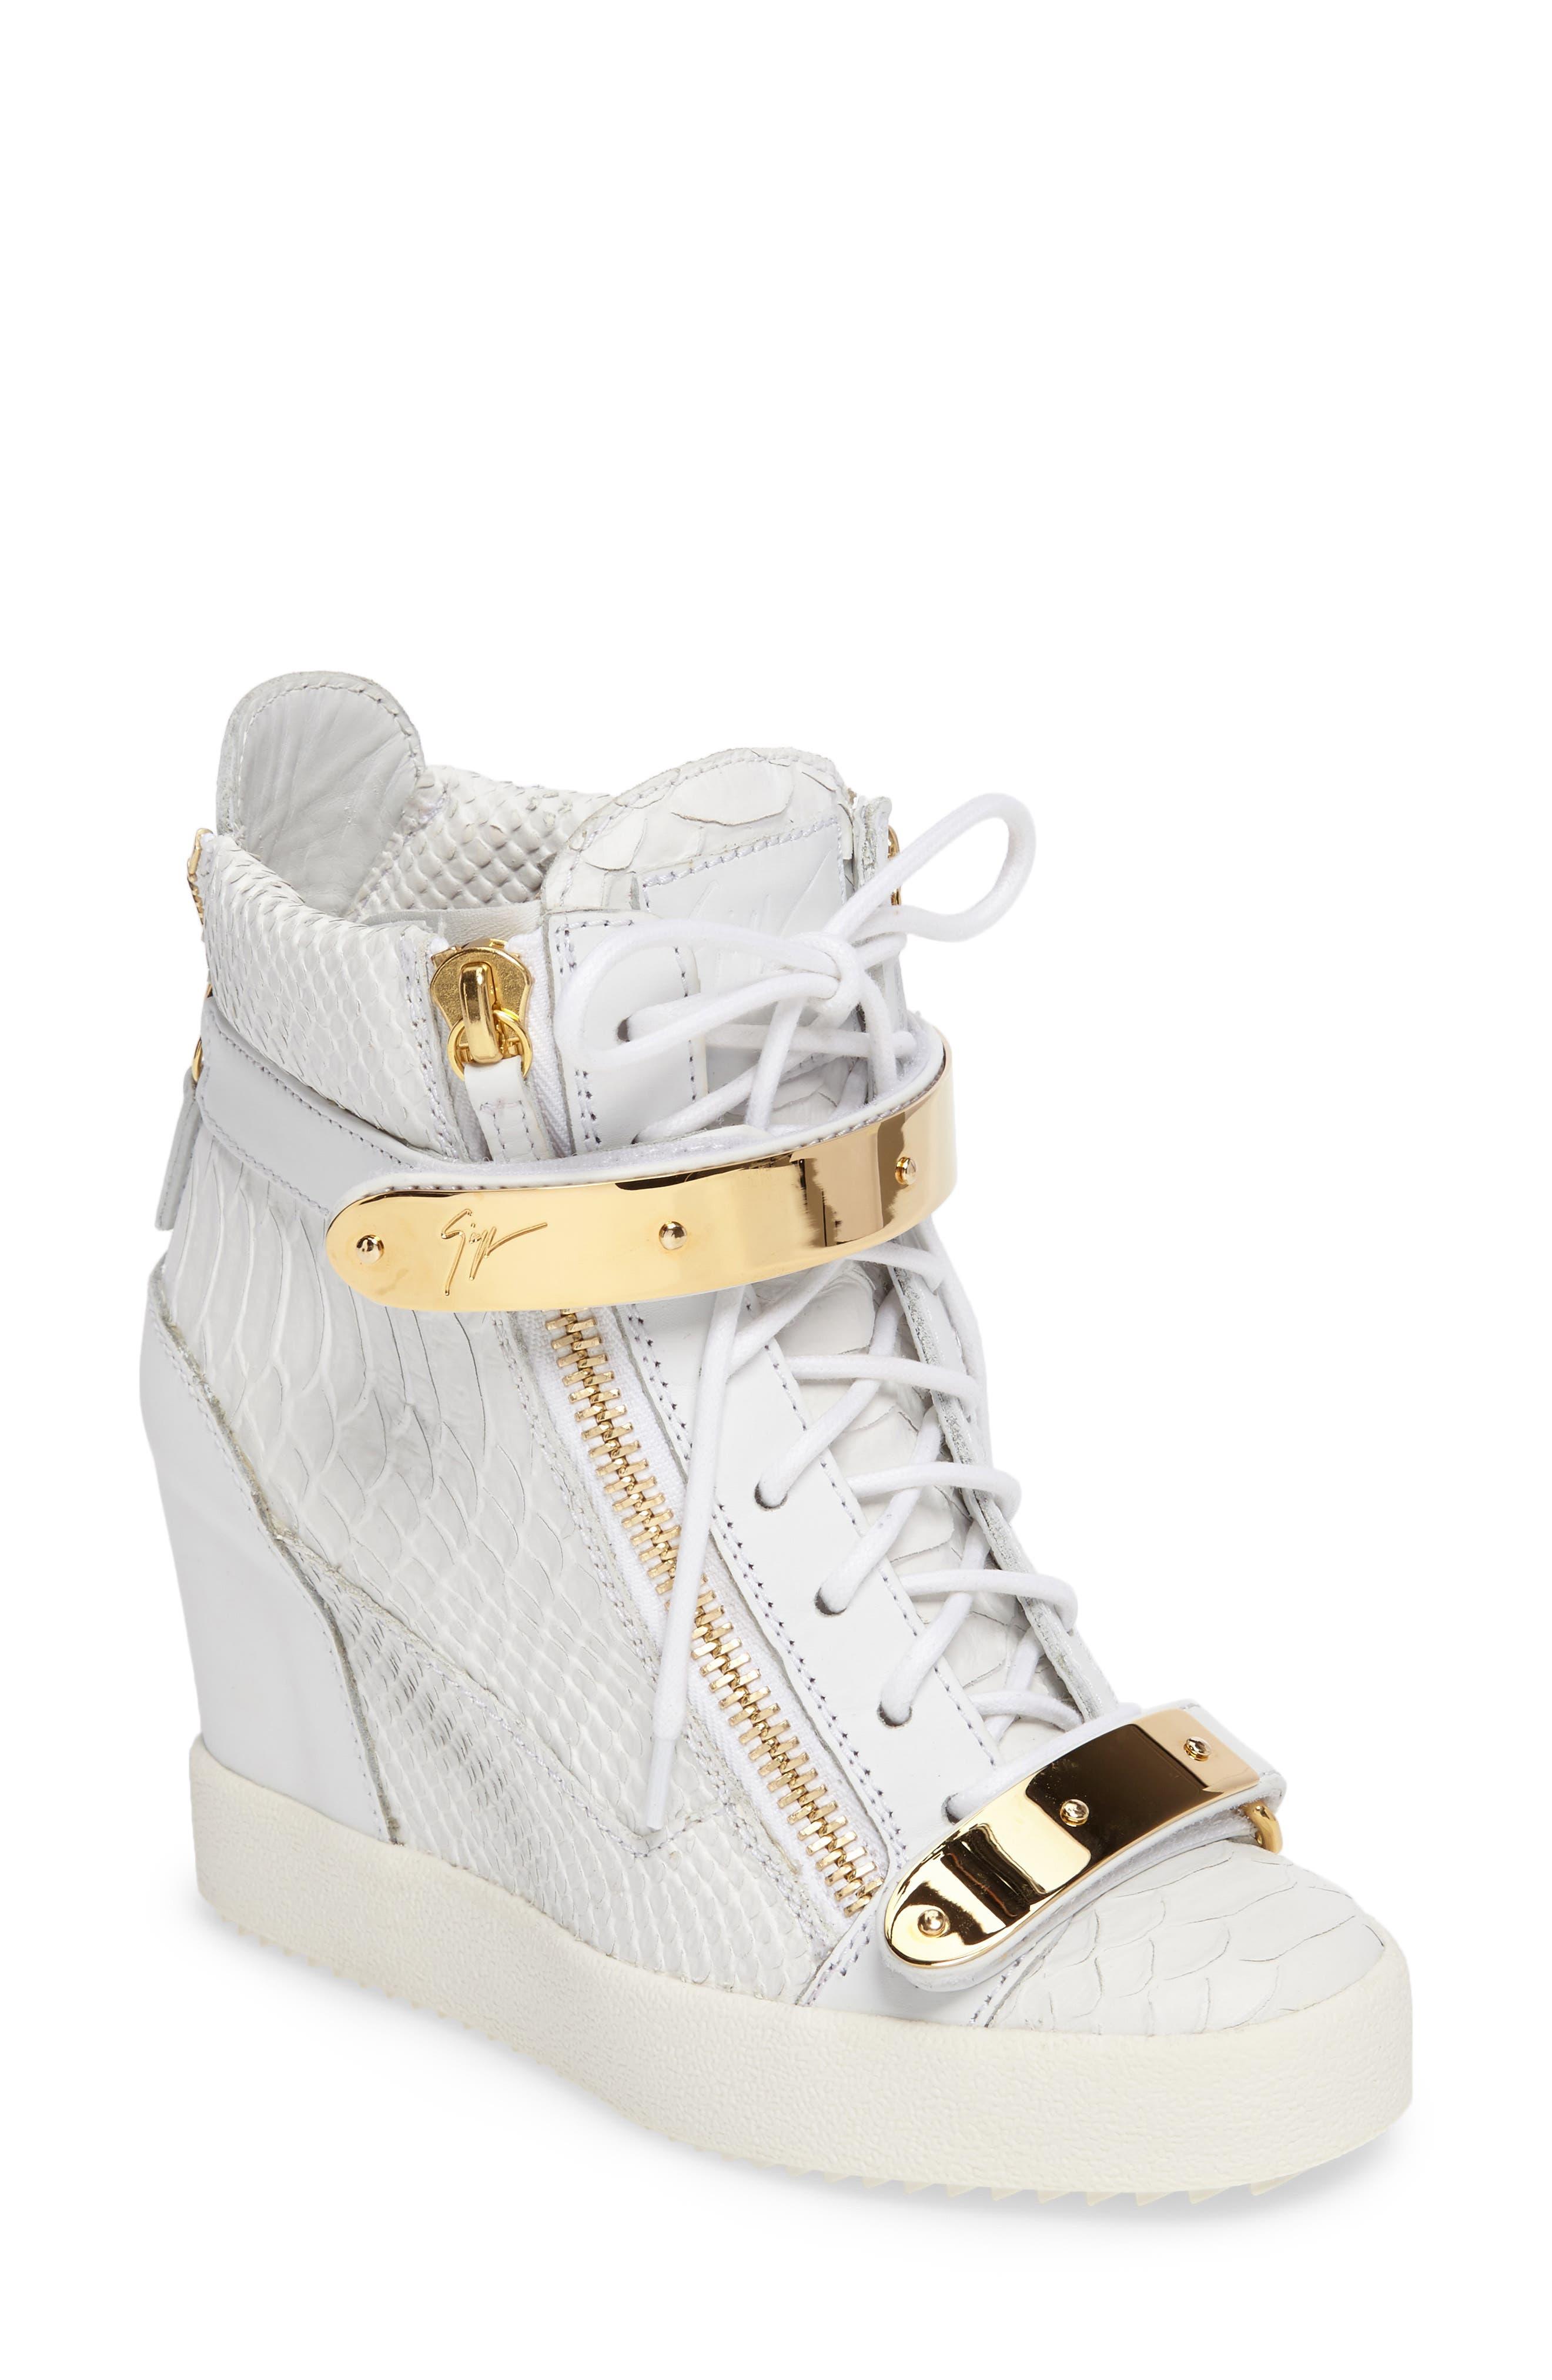 Wedge Sneaker,                             Main thumbnail 1, color,                             White